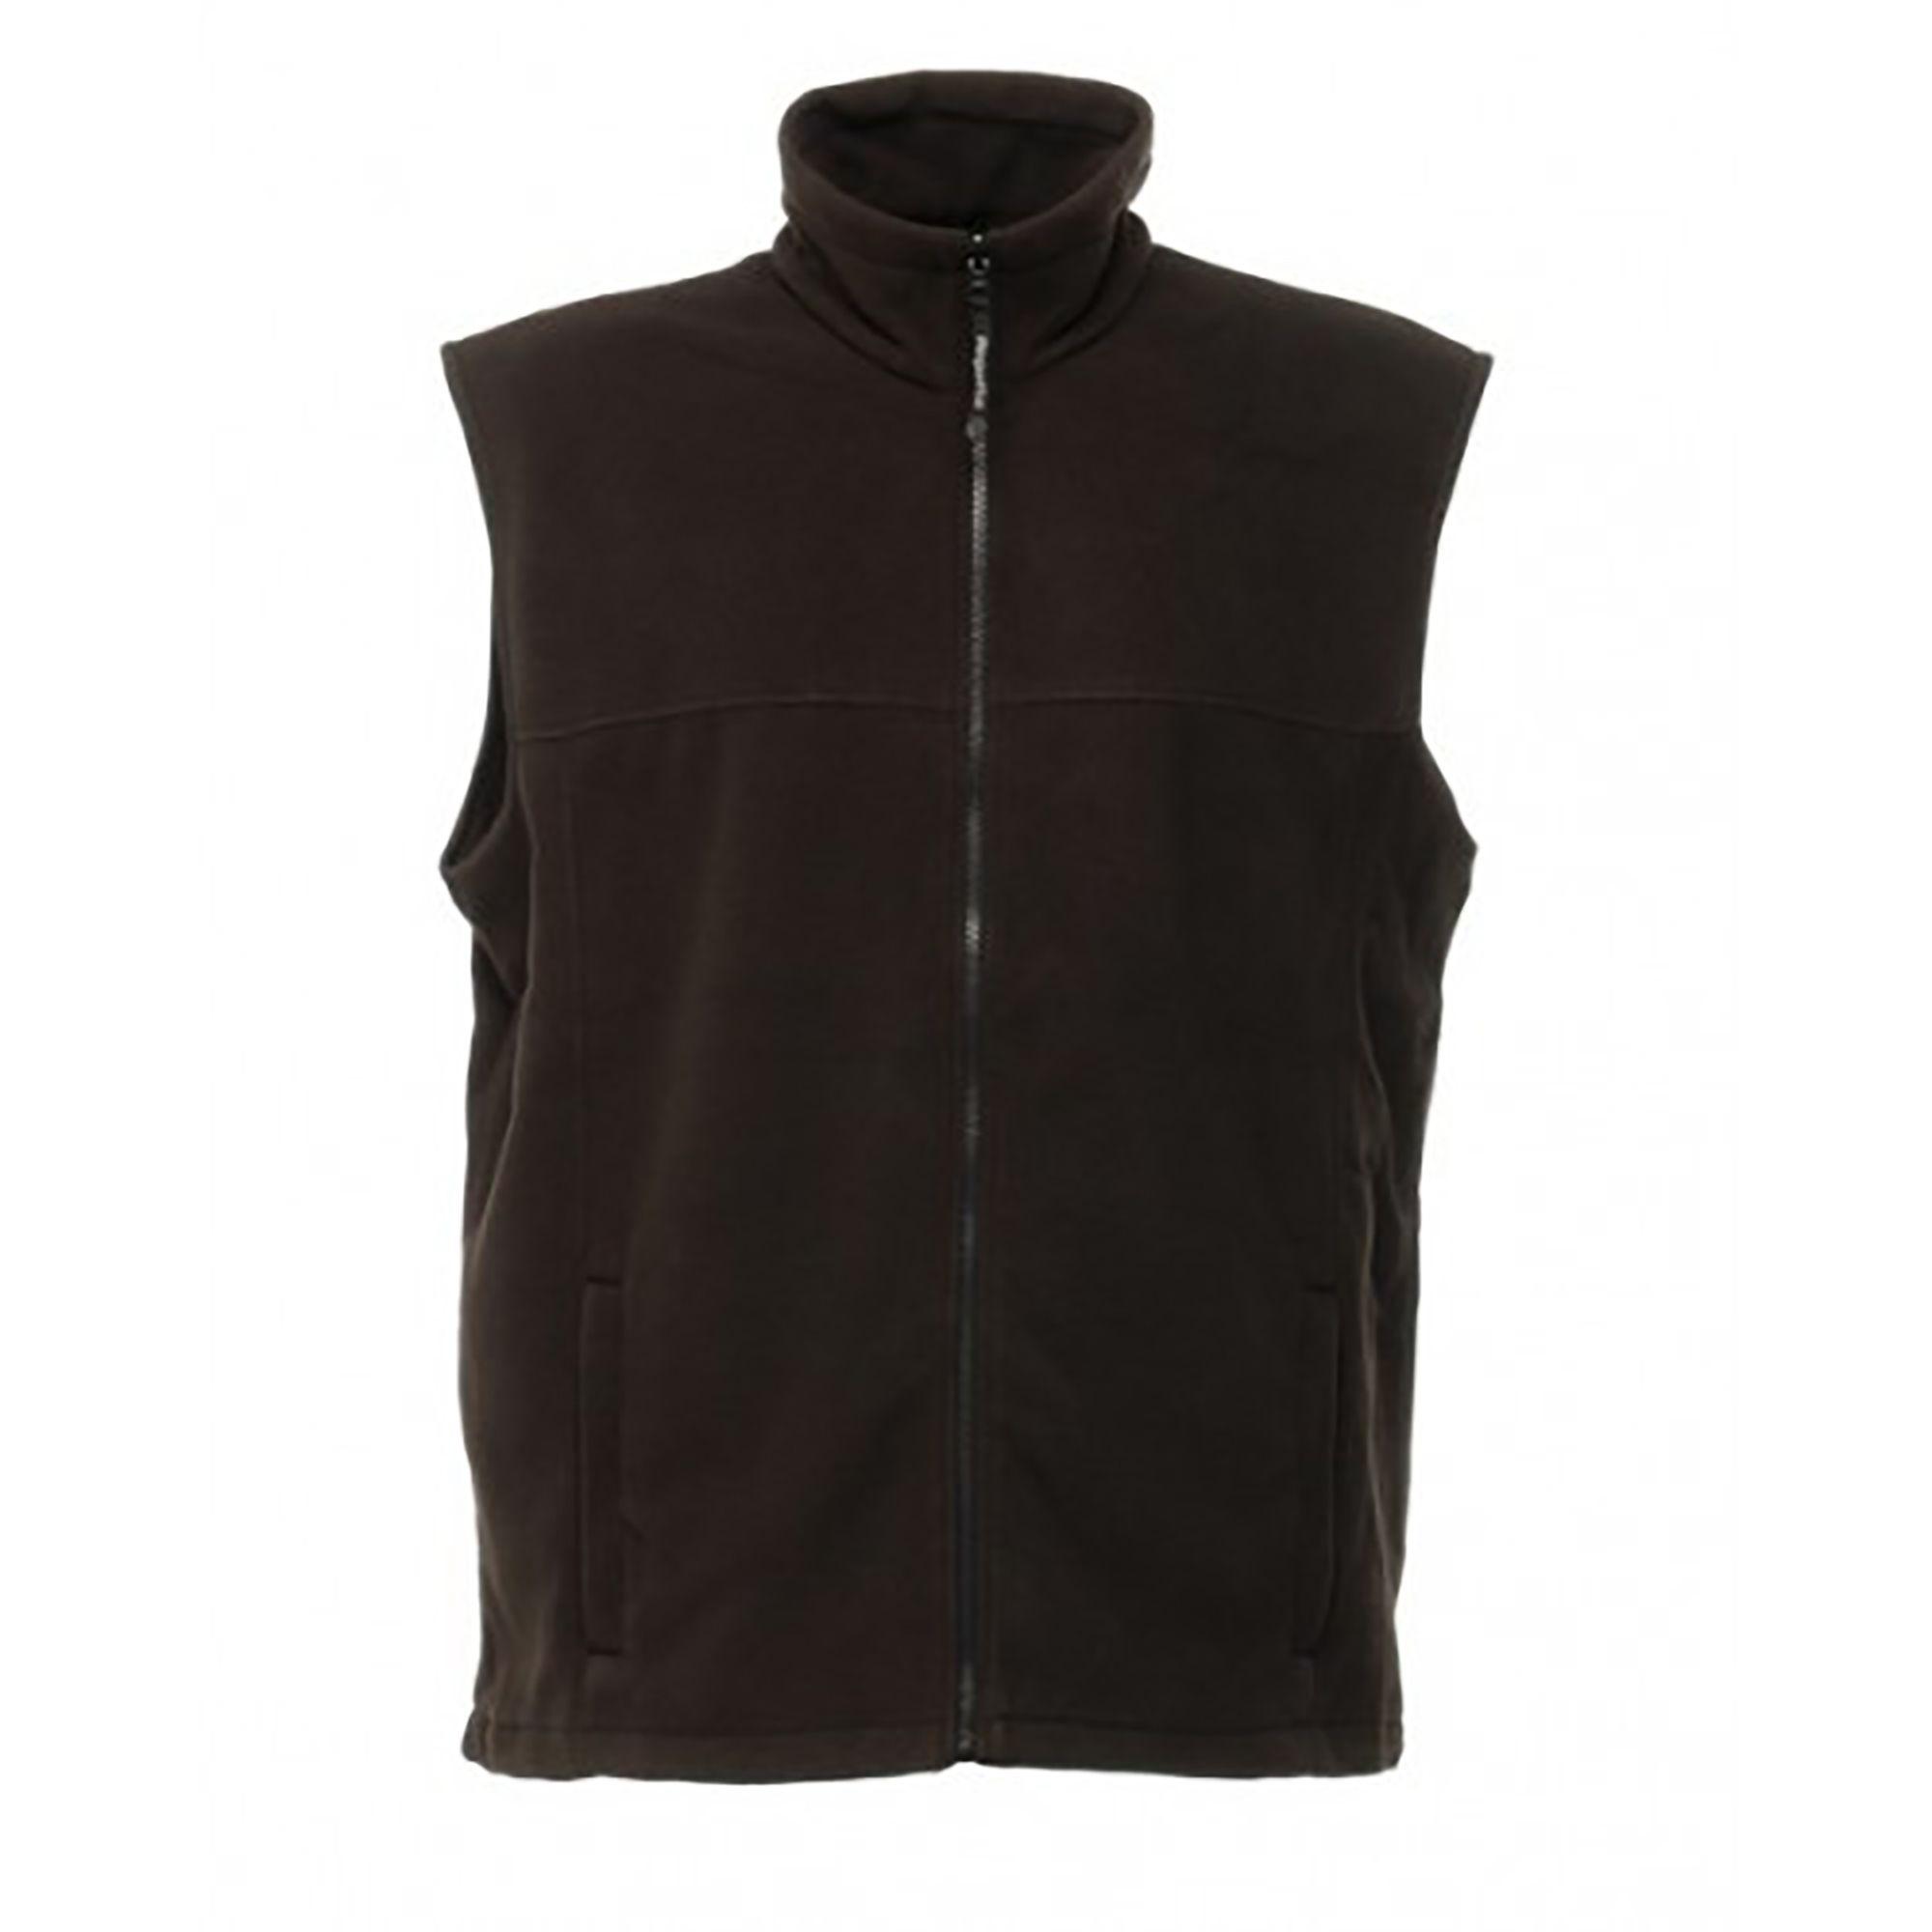 Regatta Unisex Haber II Full-Zip Bodywarmer Fleece Anti-Pill Jacket (250 GSM)